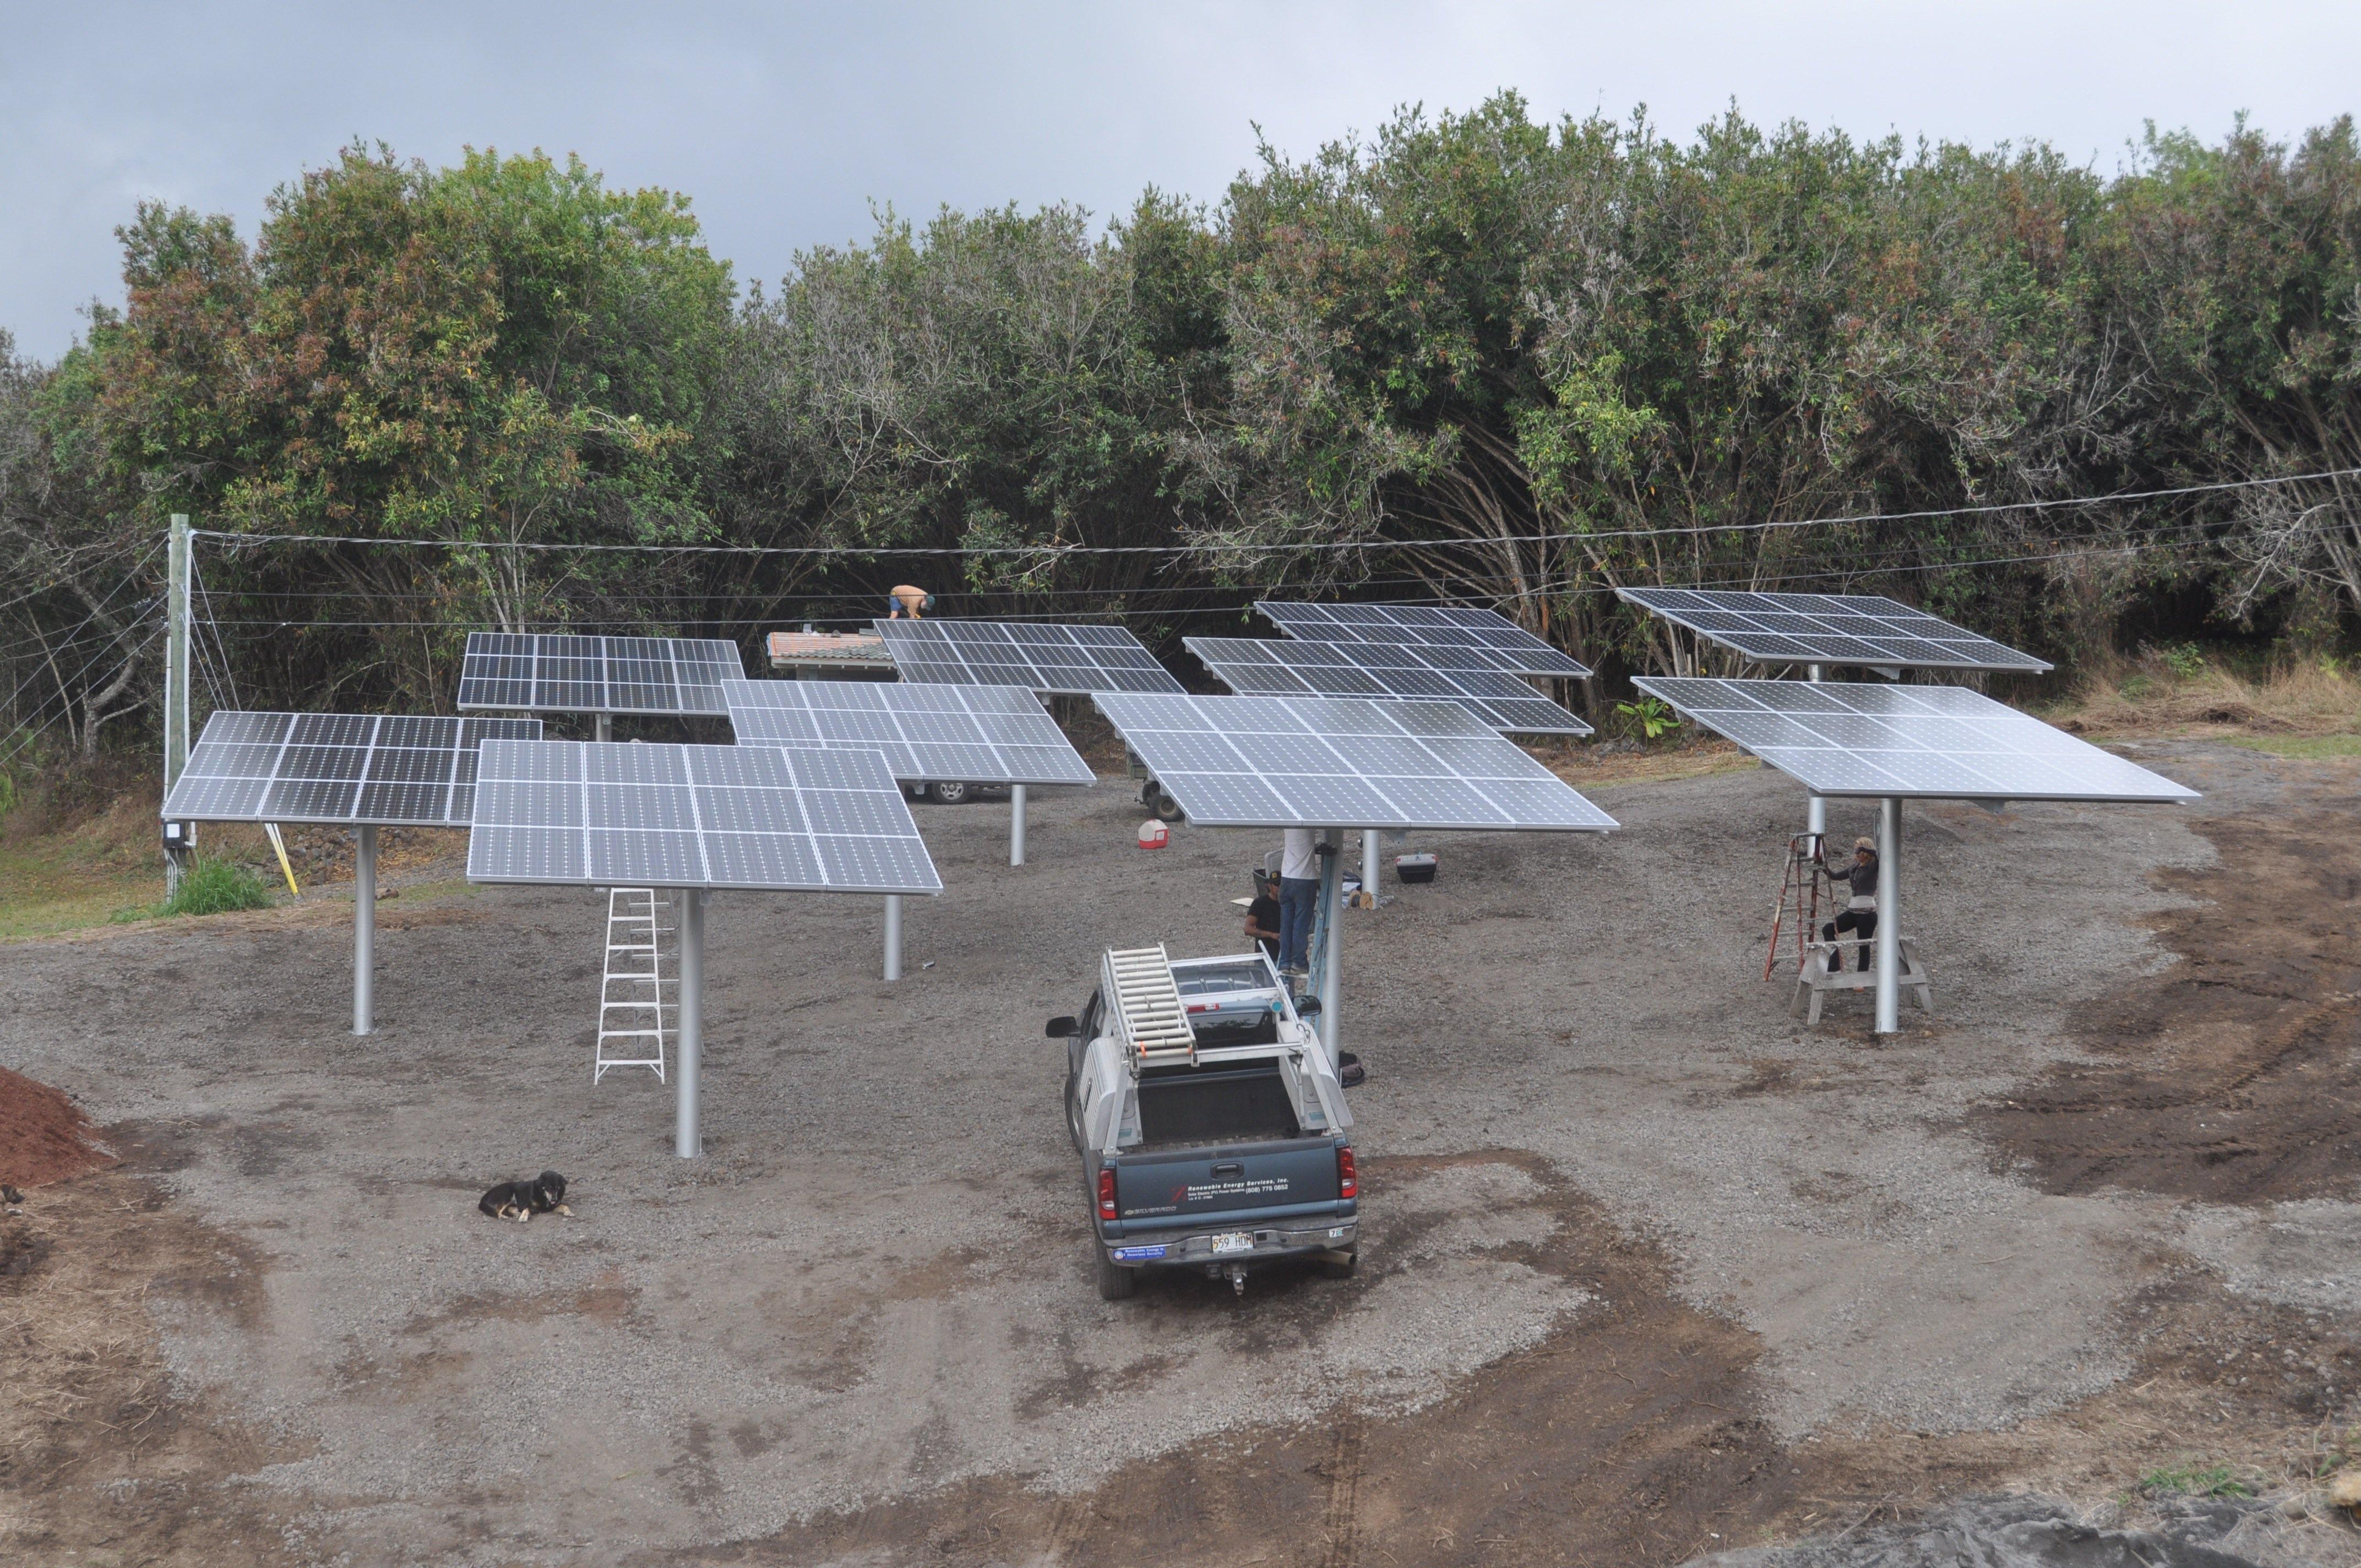 29.28 KW Solar PV system installed on rooftop in Honokaa, HI